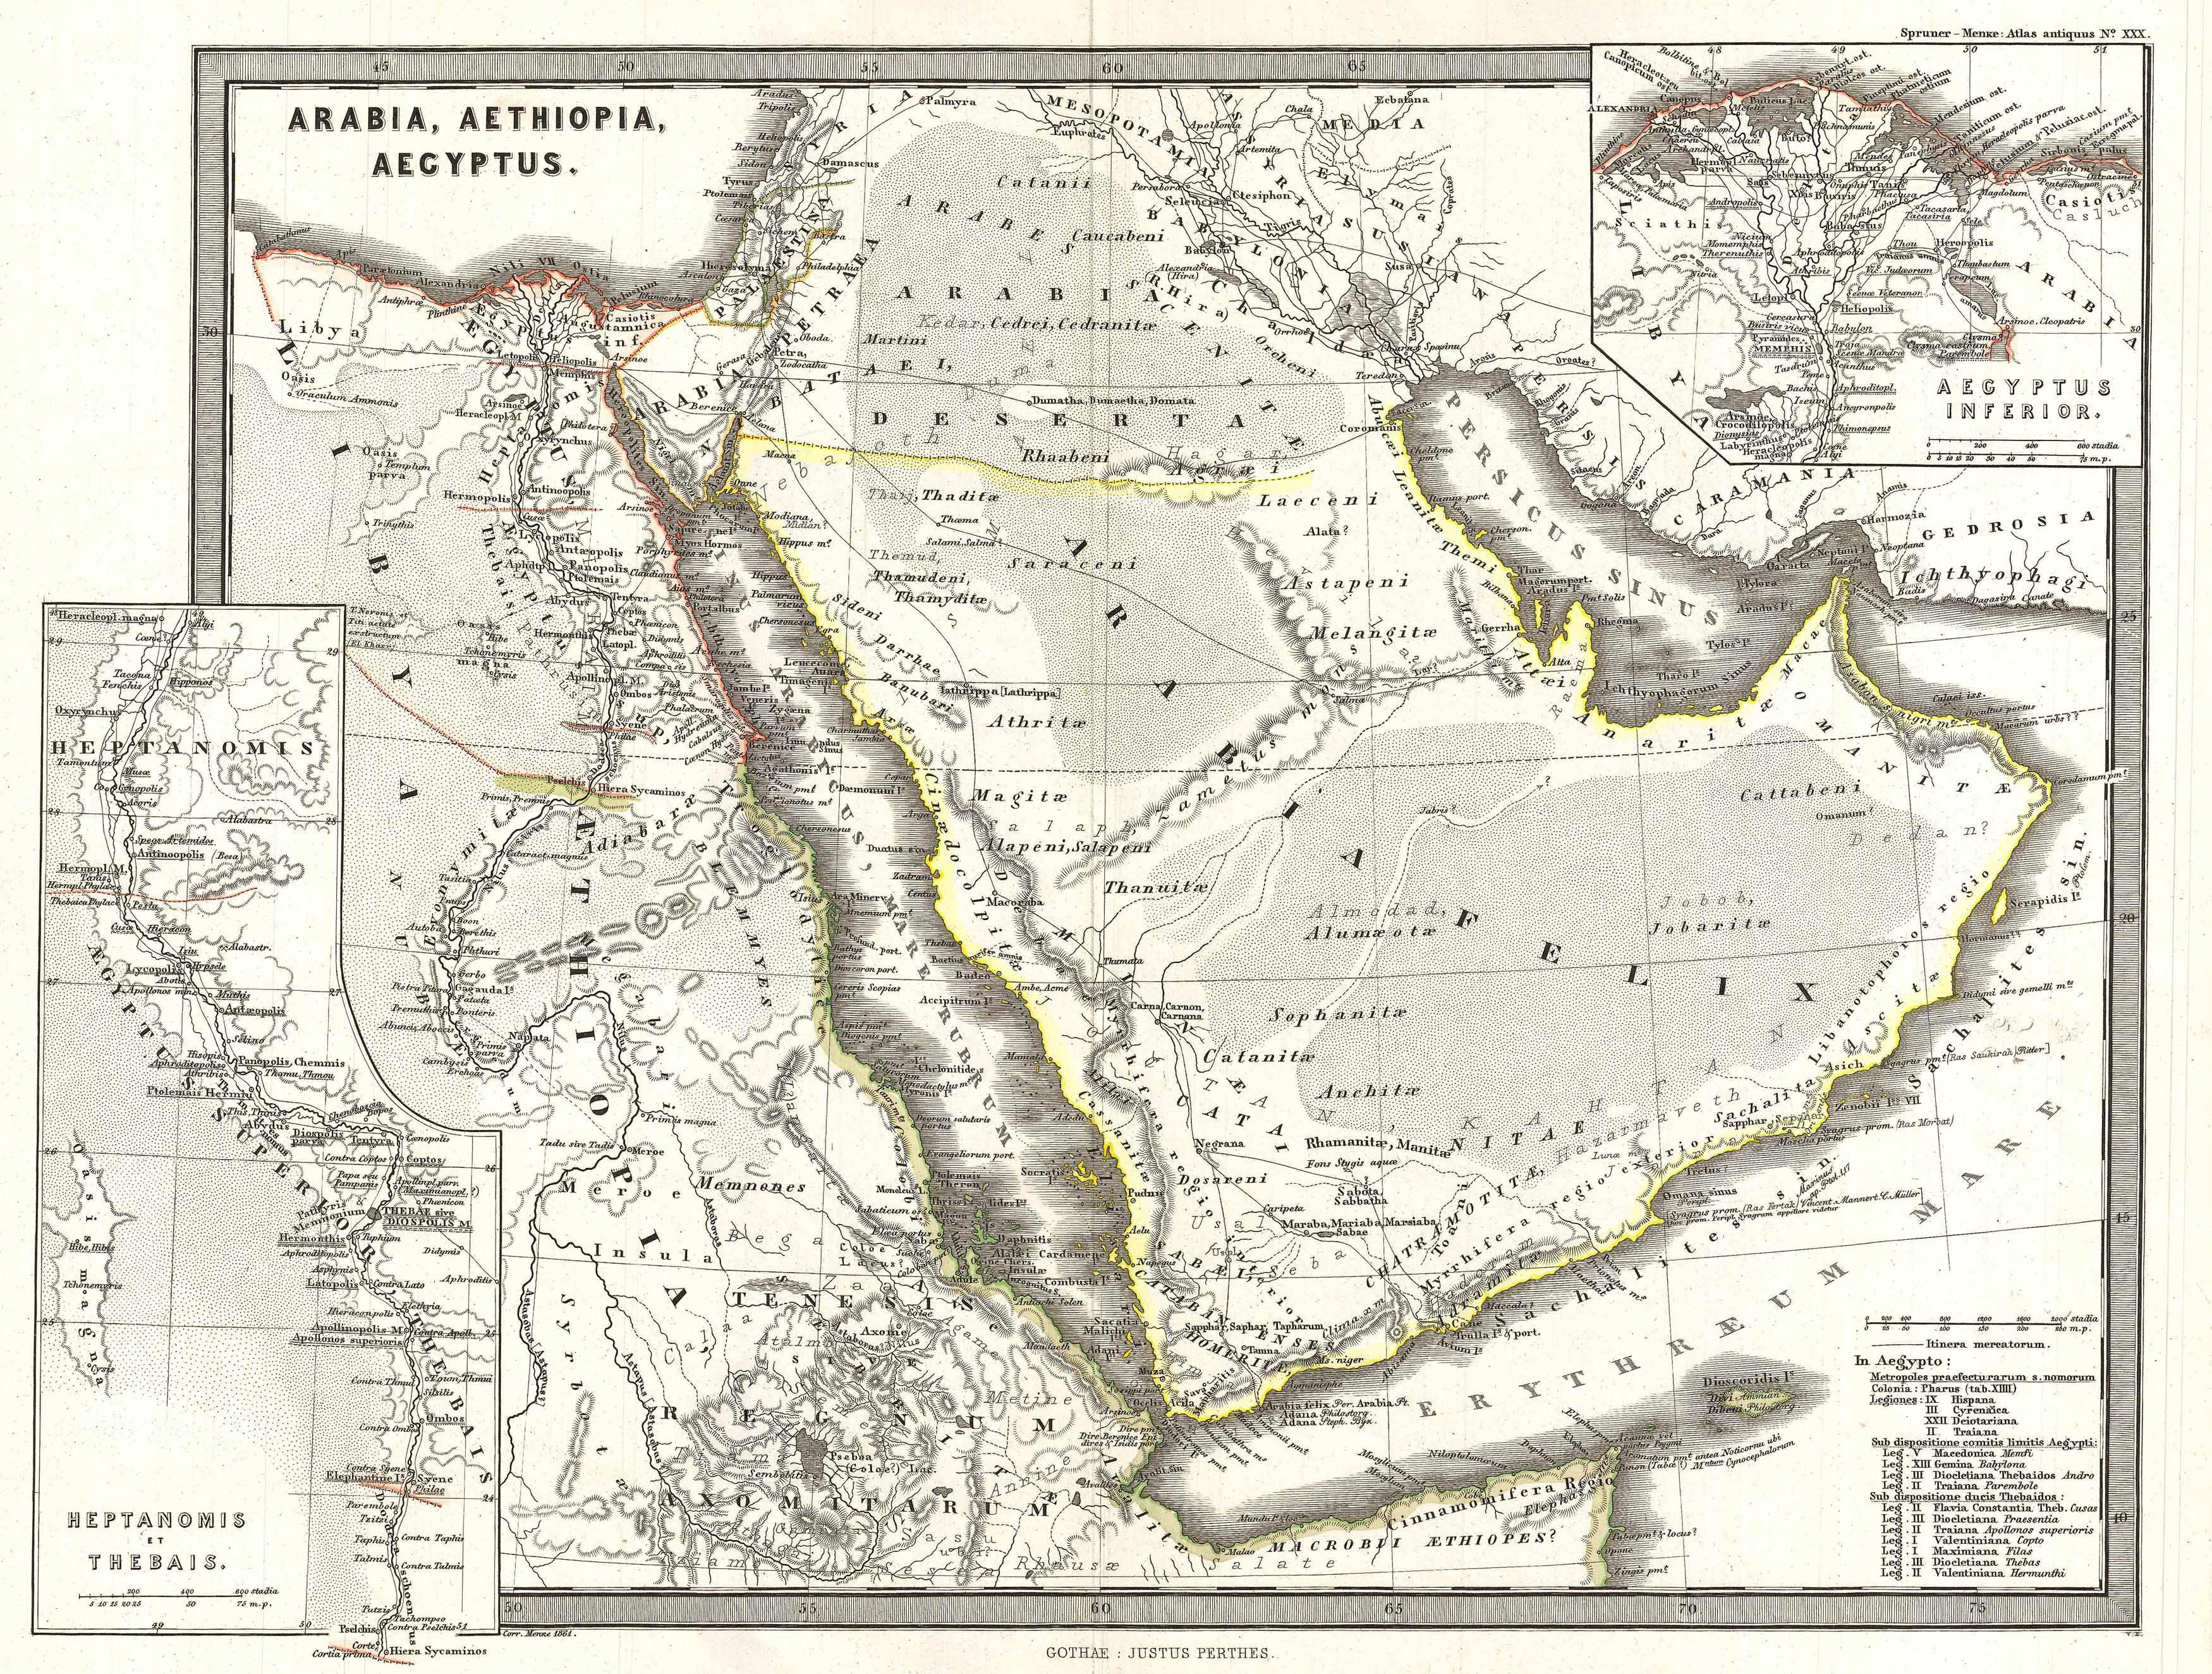 Vintage Maps of the Arabian Peninsula